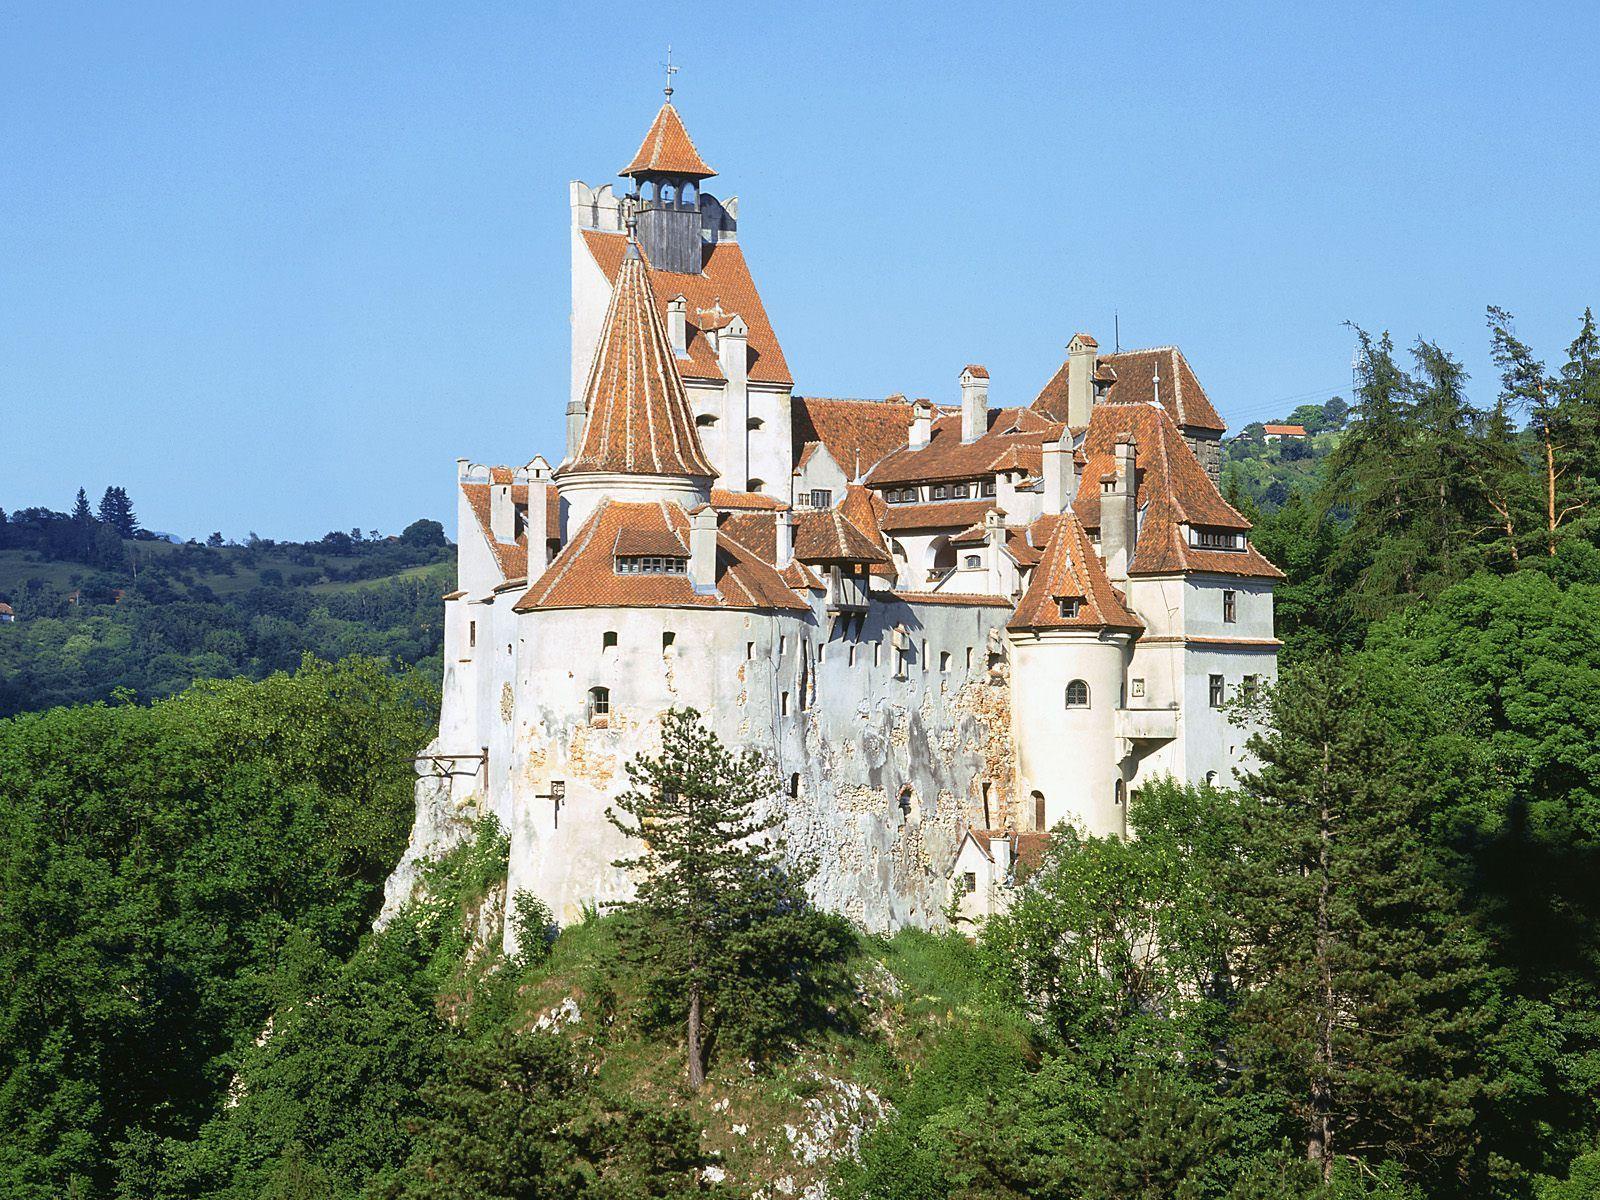 Vlad Dracula Vampires Castles Legends Truth Vs Fiction Romanian Friend,Vintage French Decorating Ideas